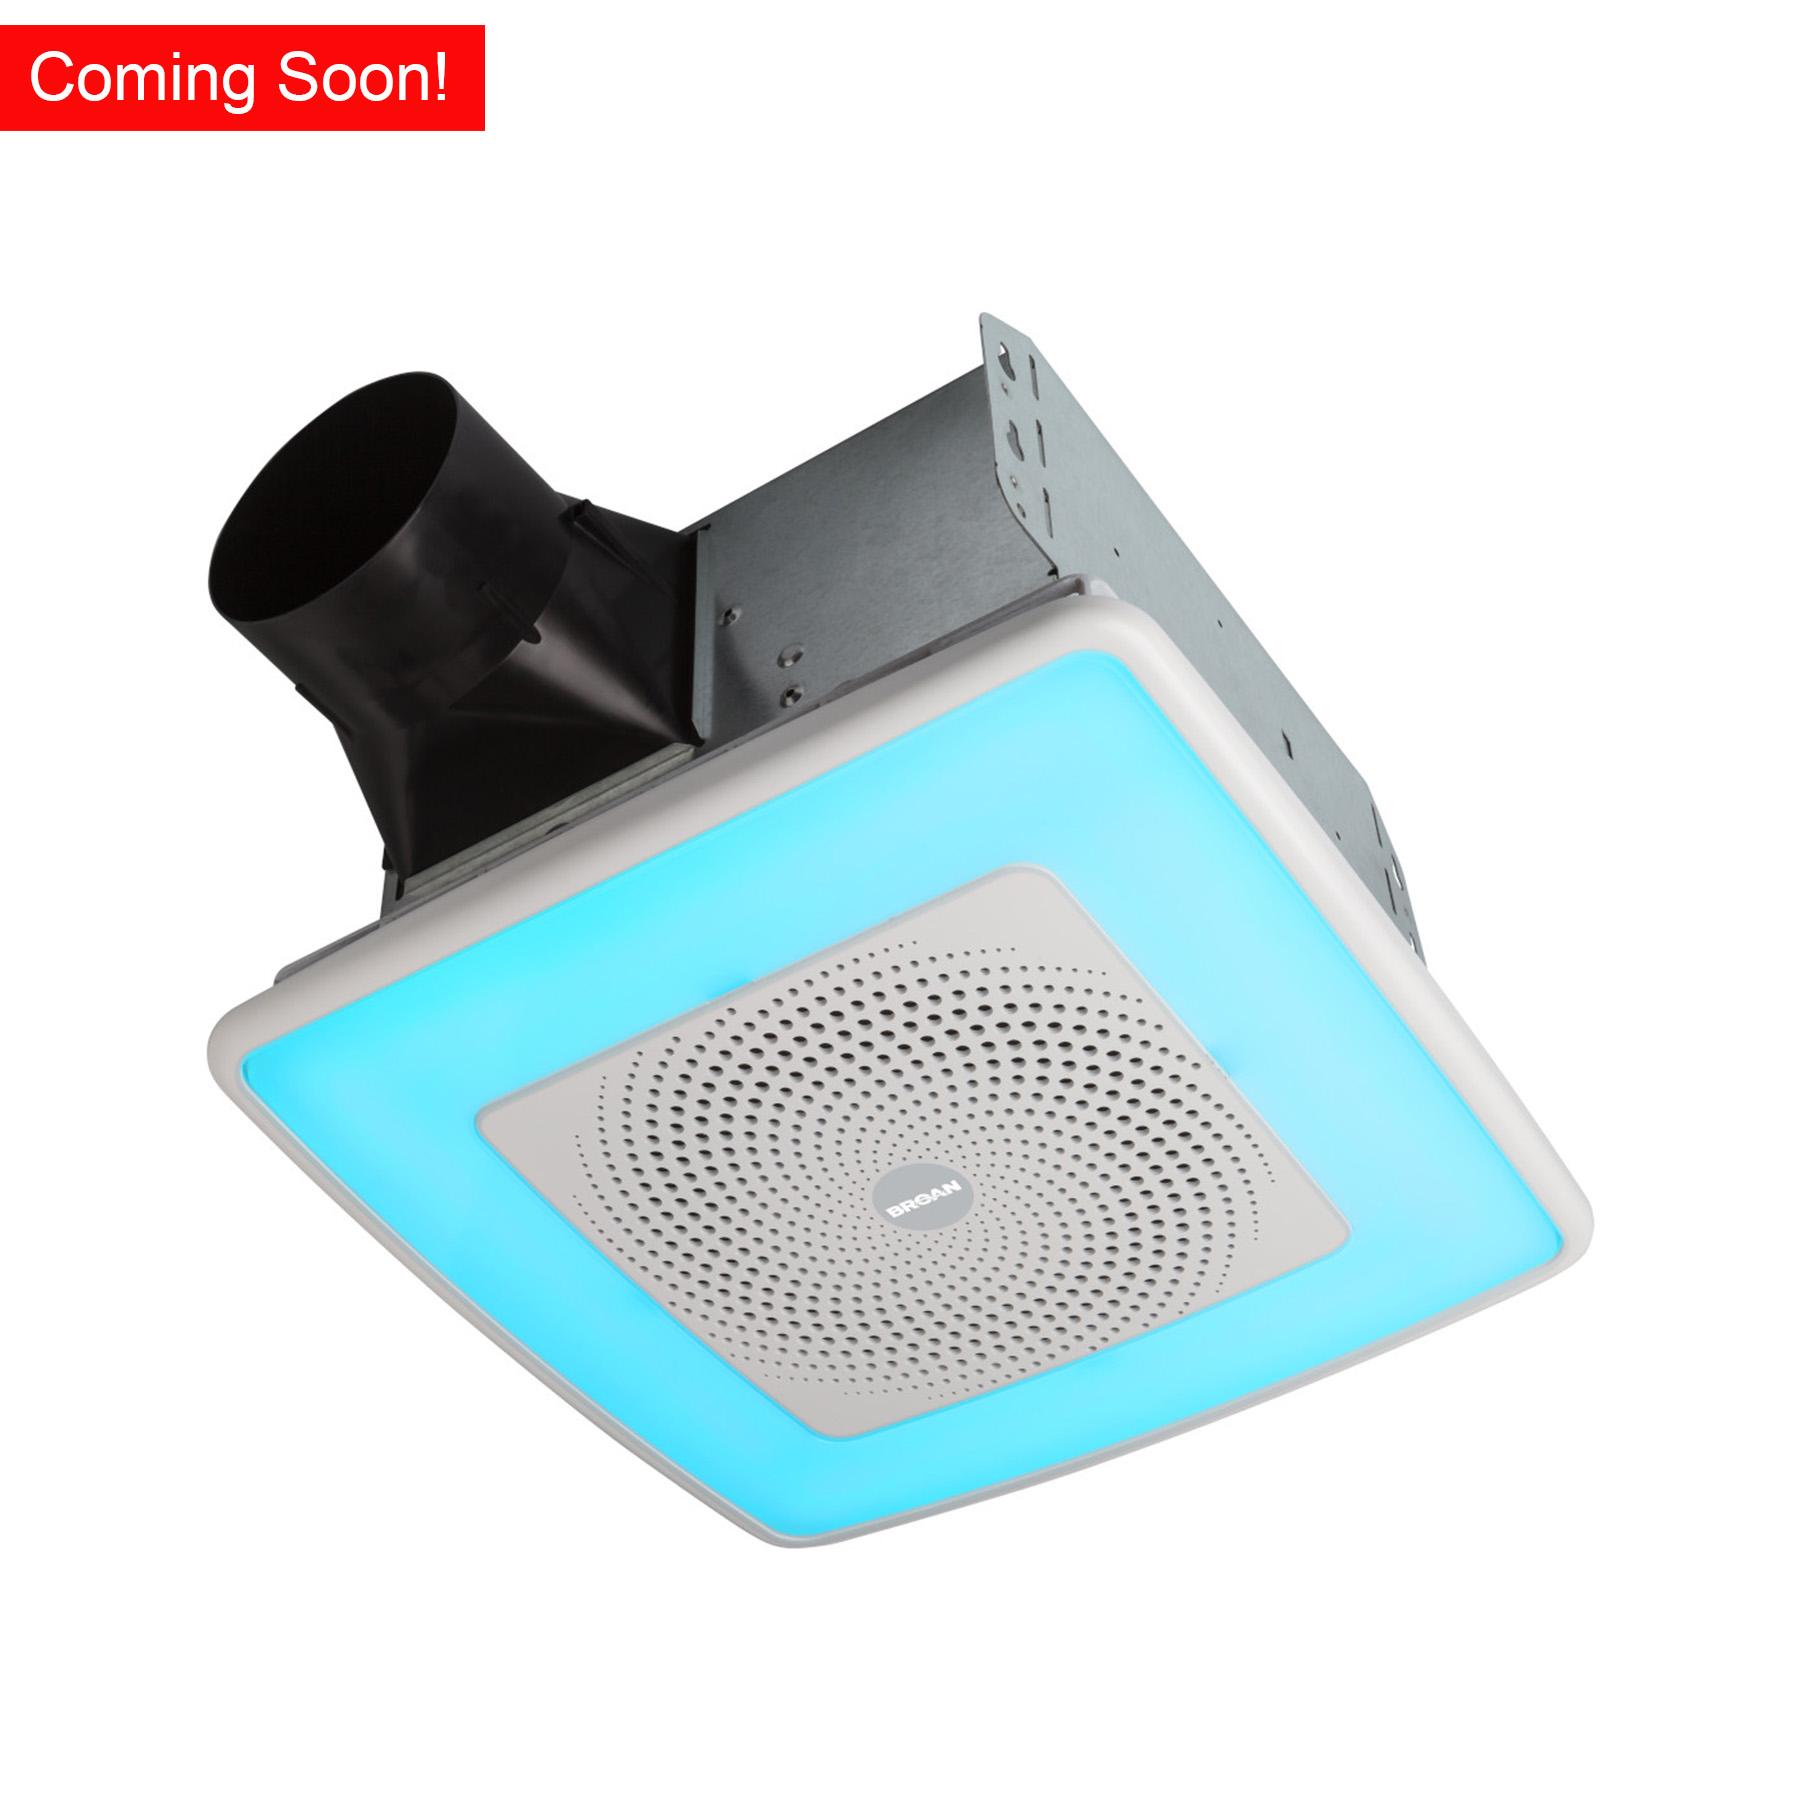 Bluetooth Fans, Nutone Bathroom Exhaust Fan With Light